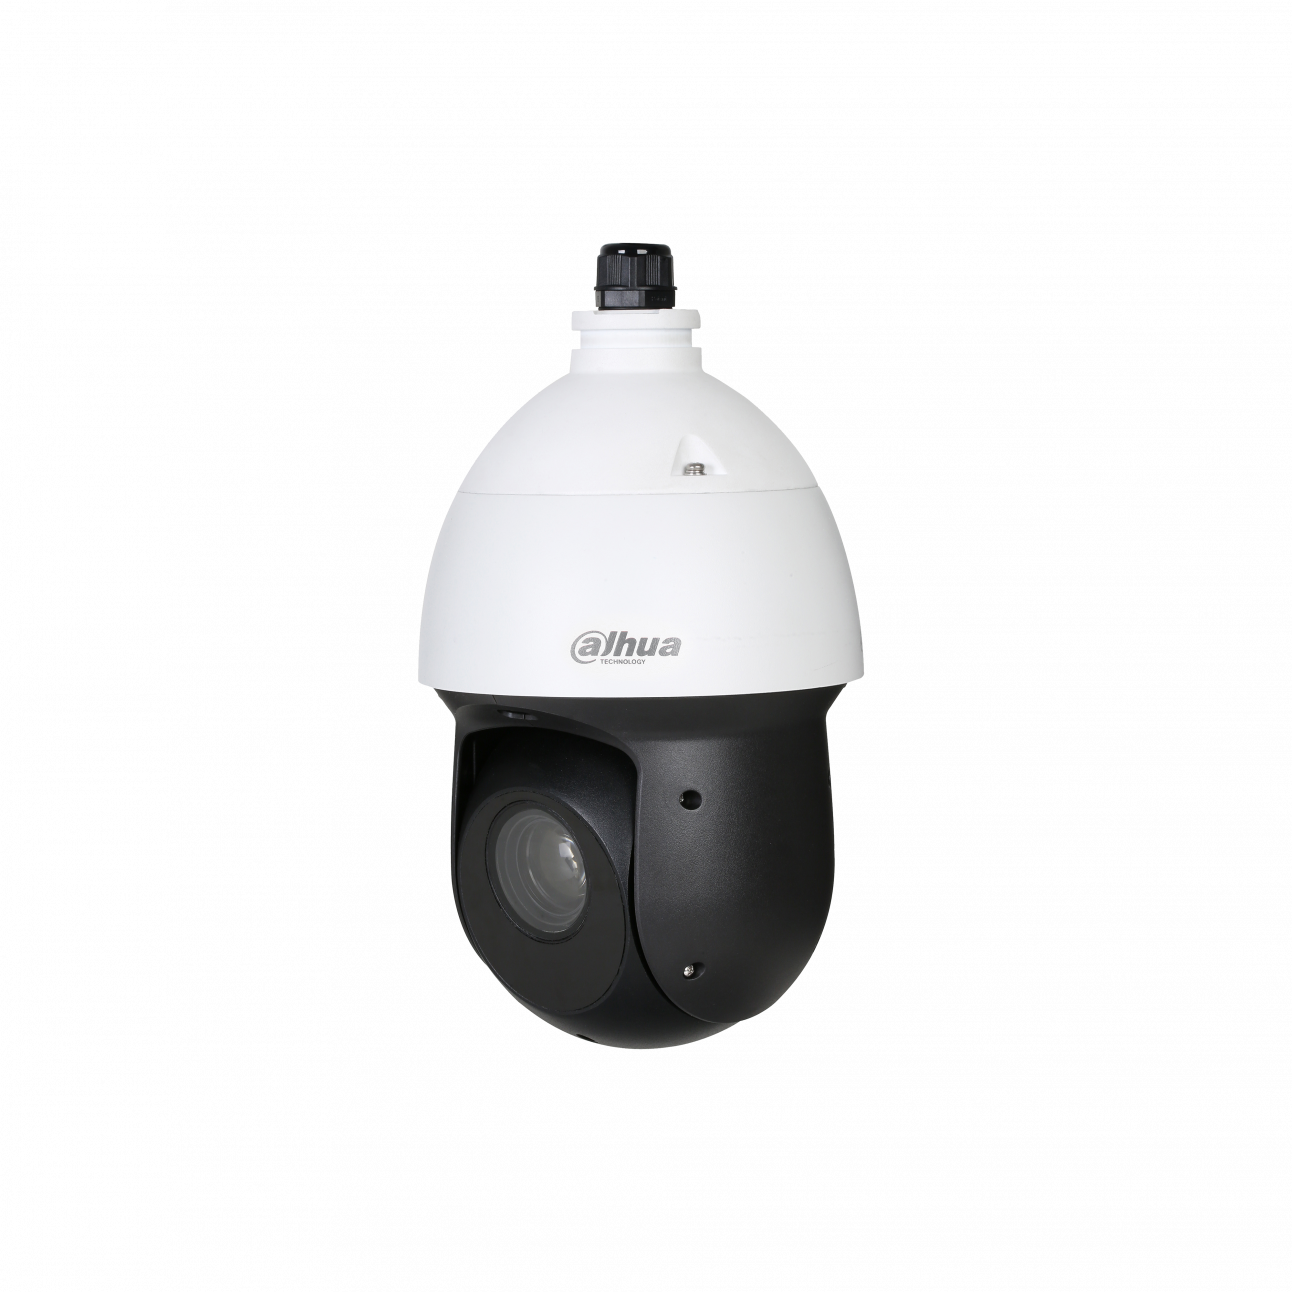 IP камера Dahua DH-SD49425XB-HNR уличная поворотная 4Мп, опт. увеличение 25x,  MicroSD, ИК до 100м, DC12В, IP66, WDR